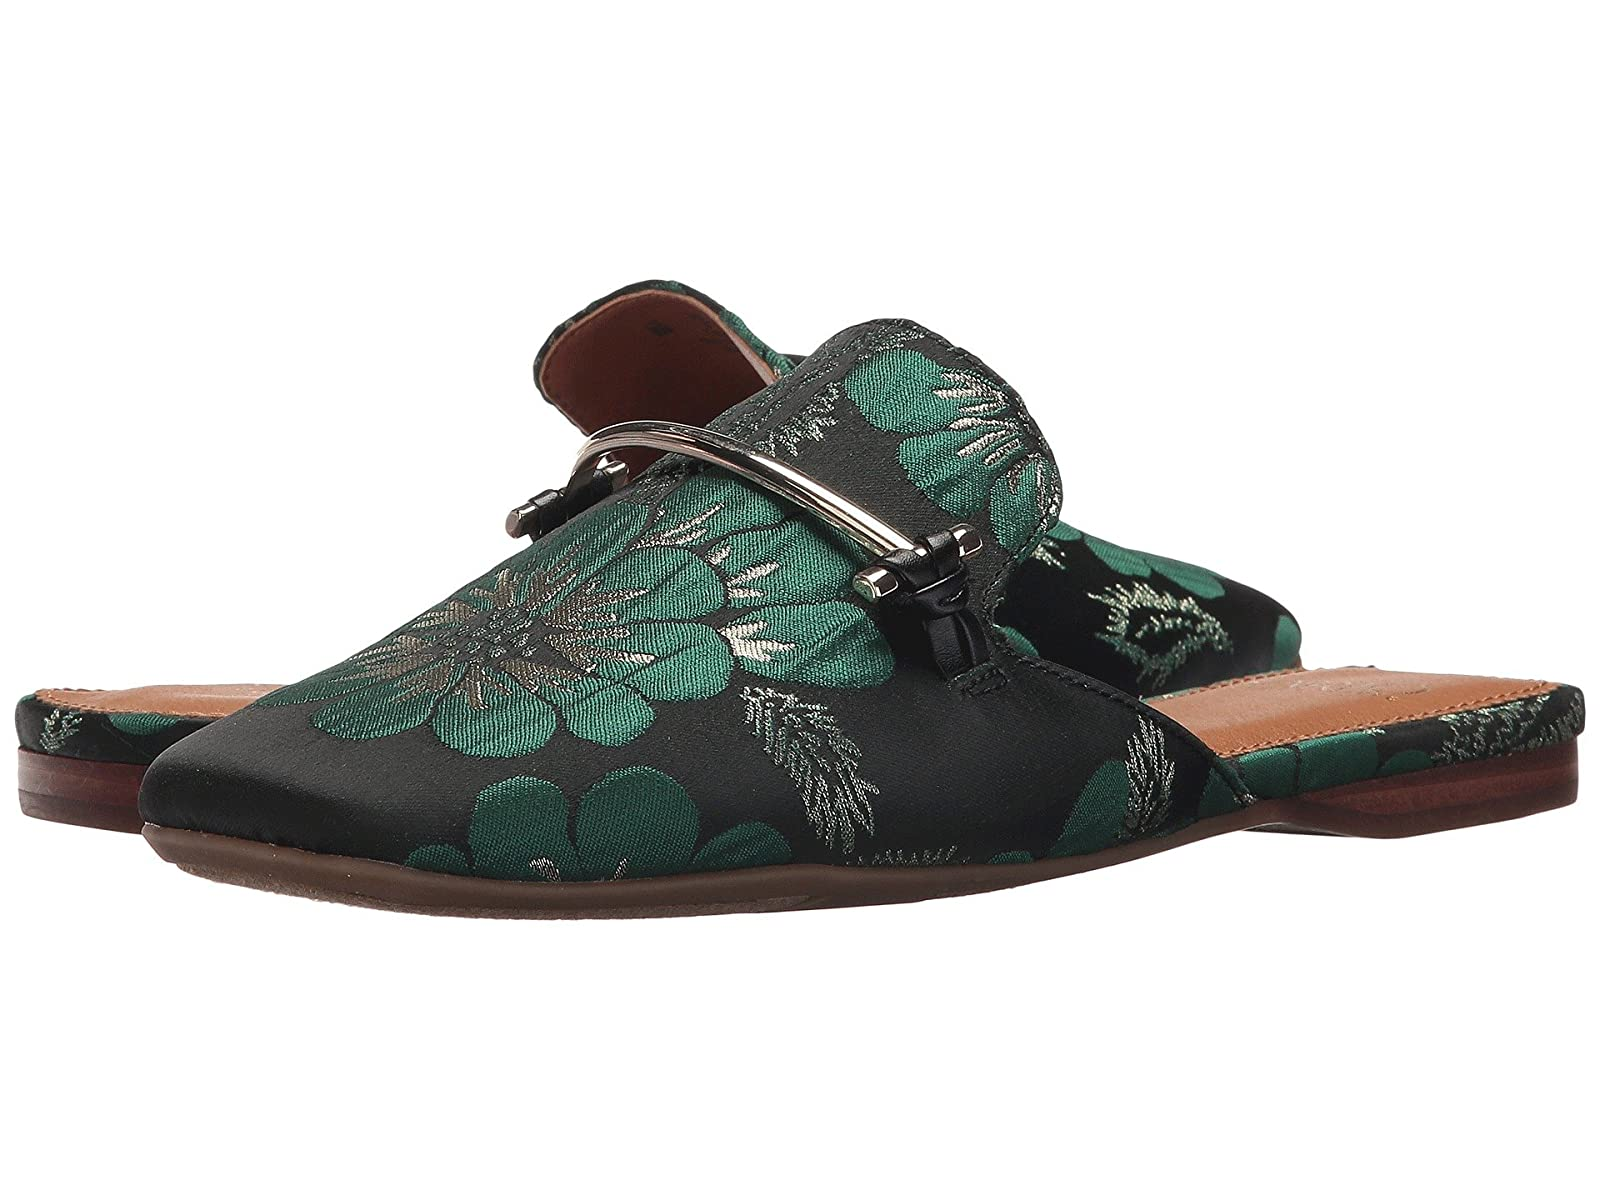 Franco Sarto Venna by SARTOCheap and distinctive eye-catching shoes